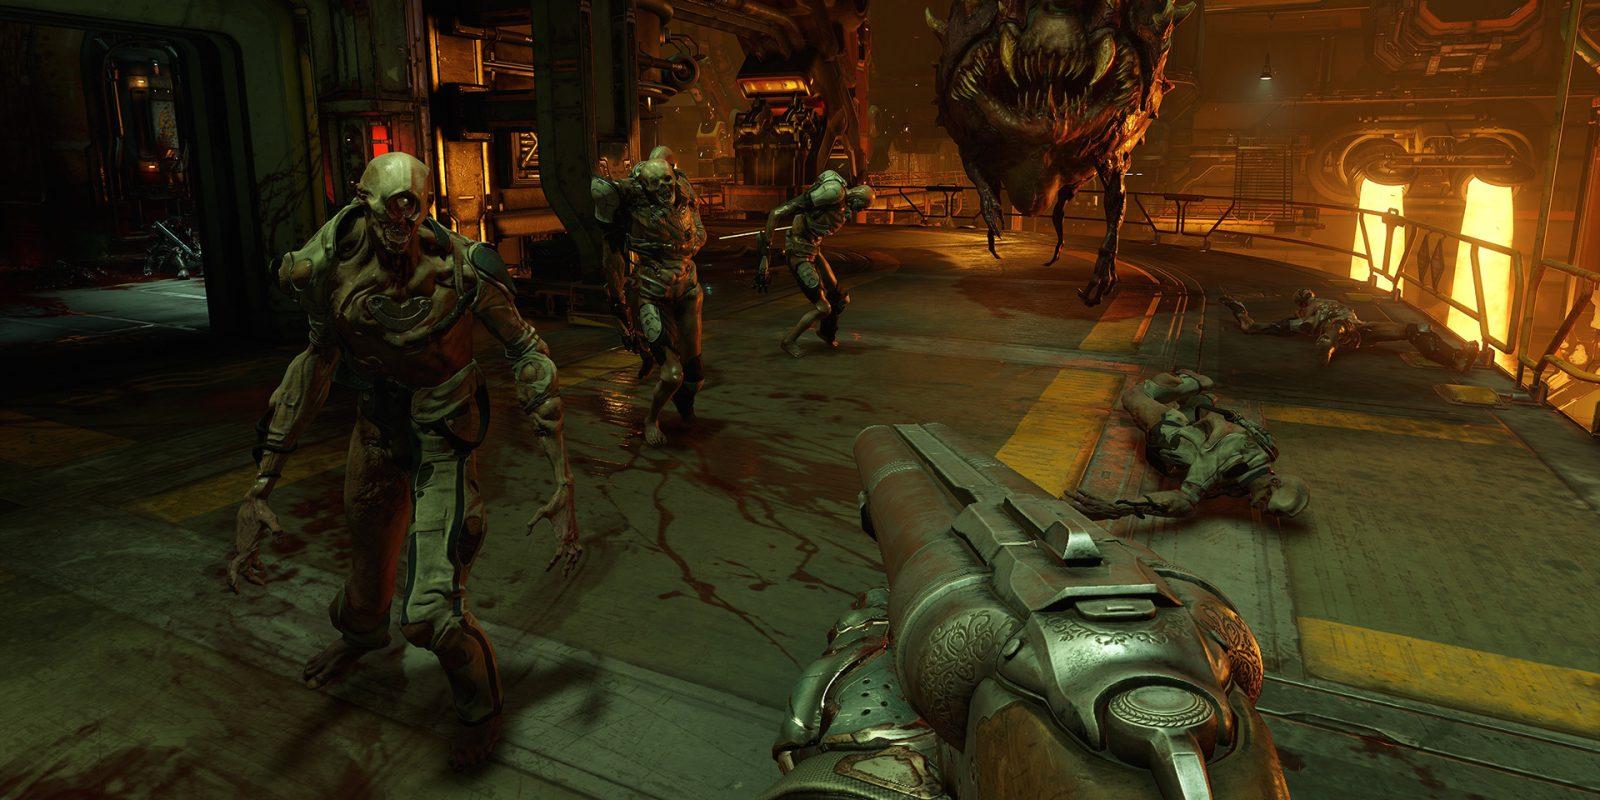 Today's Best Game Deals: DOOM $10, Resident Evil Origins Collection $40, more